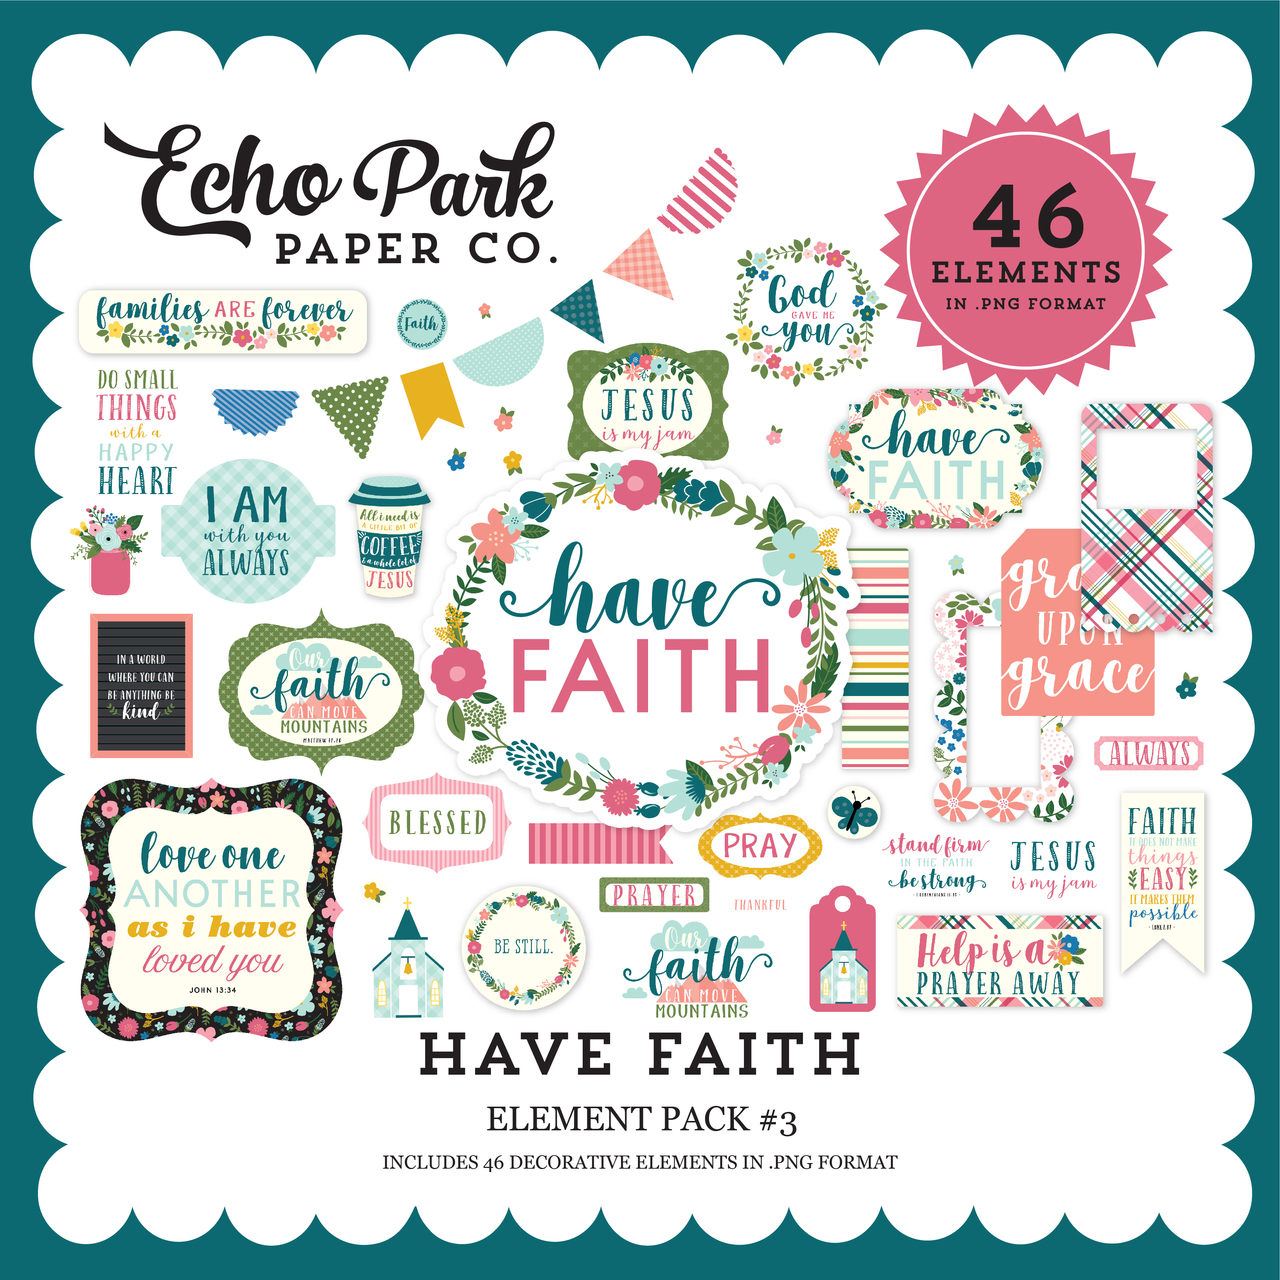 Have Faith Element Pack #3